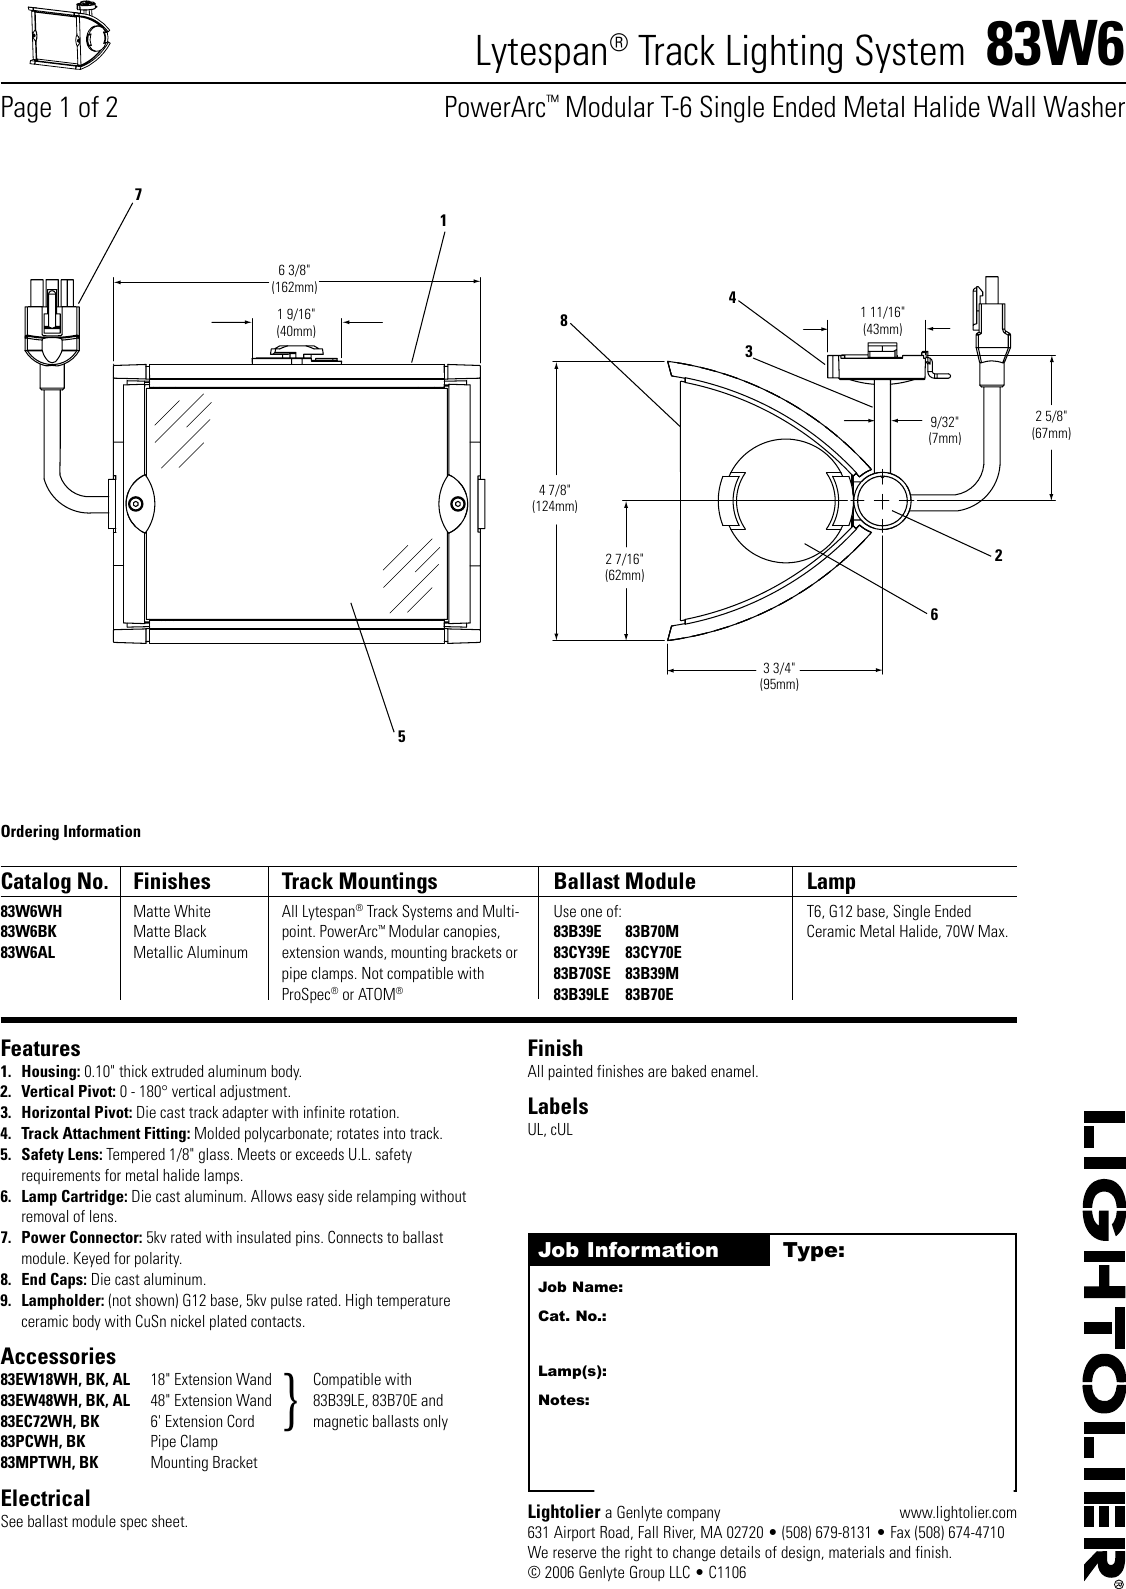 Lightolier lytespan track lighting system 83w6 users manual aloadofball Choice Image